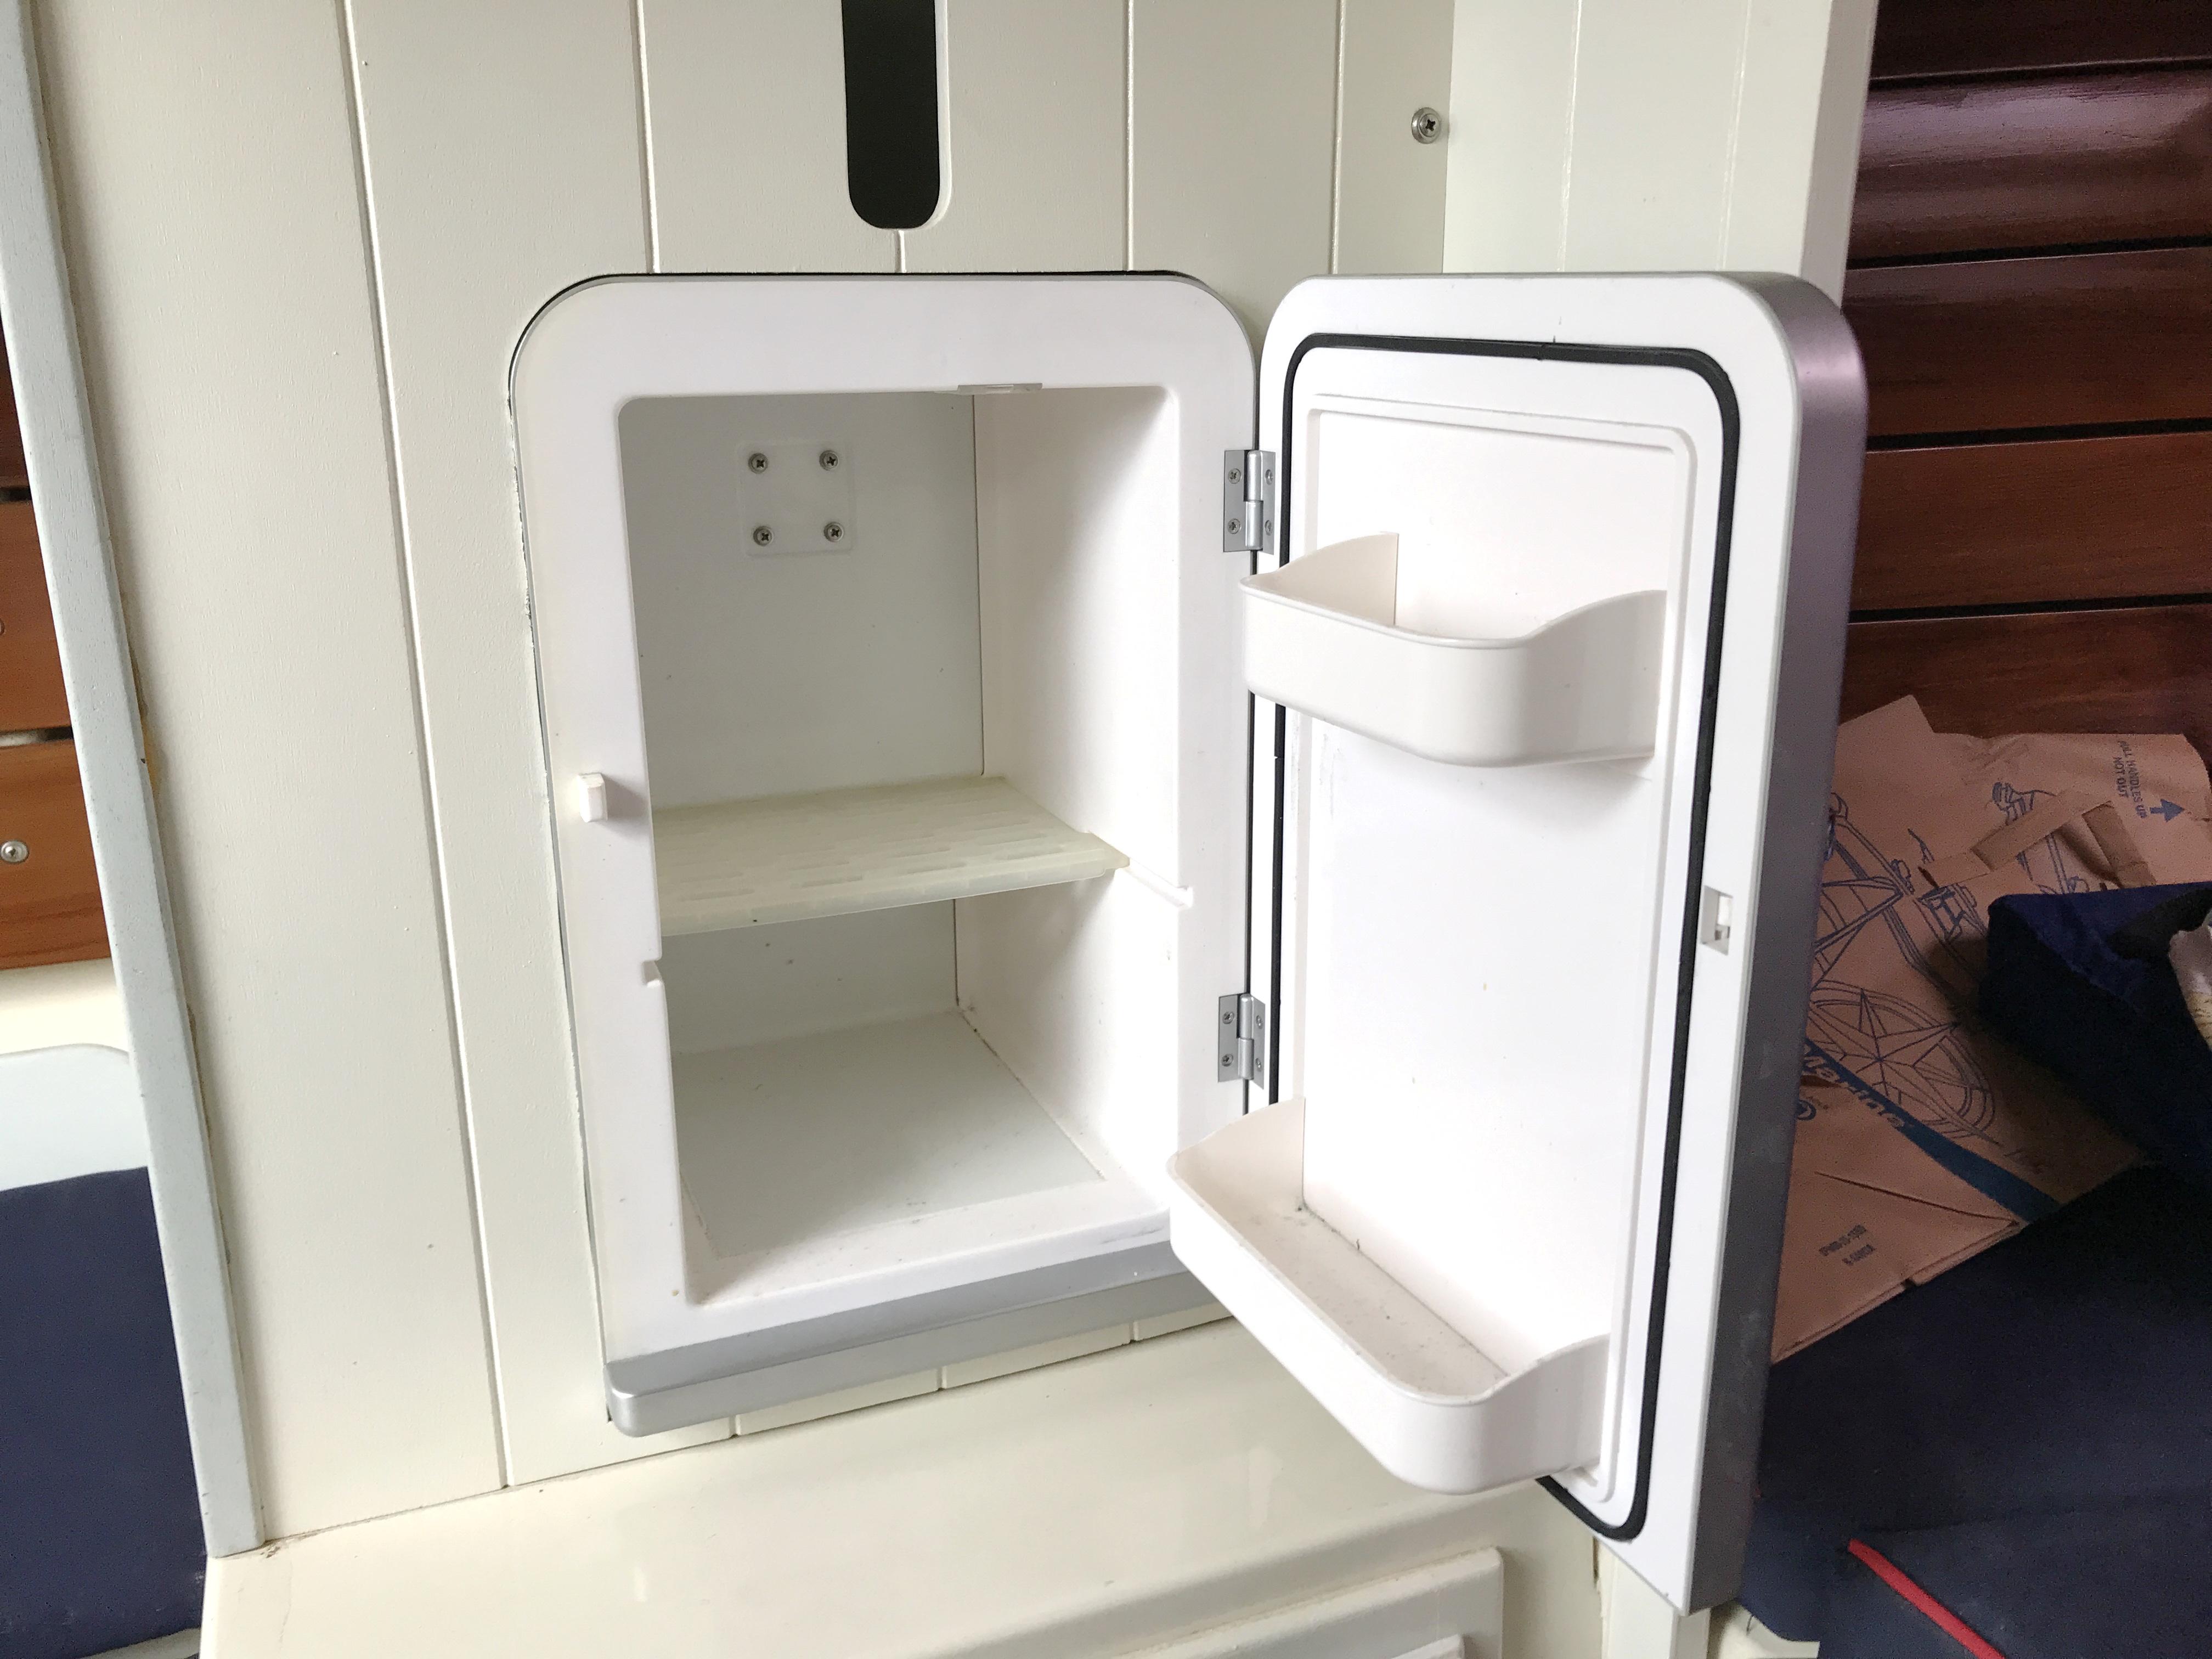 Cornish Crabbers Crabber 22 - refrigerator